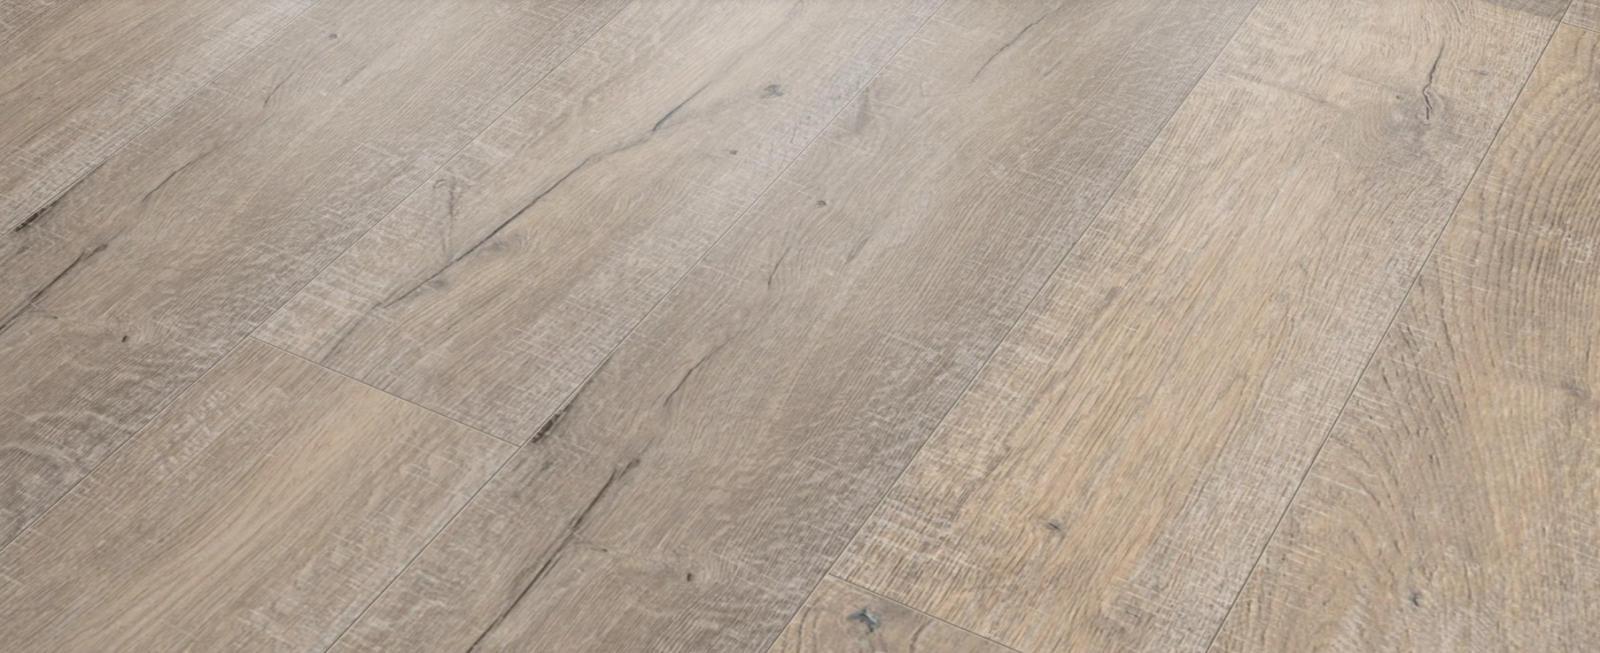 classen dizajnova podlaha classen neo 2 0 41117 textured oak design boden by classen. Black Bedroom Furniture Sets. Home Design Ideas